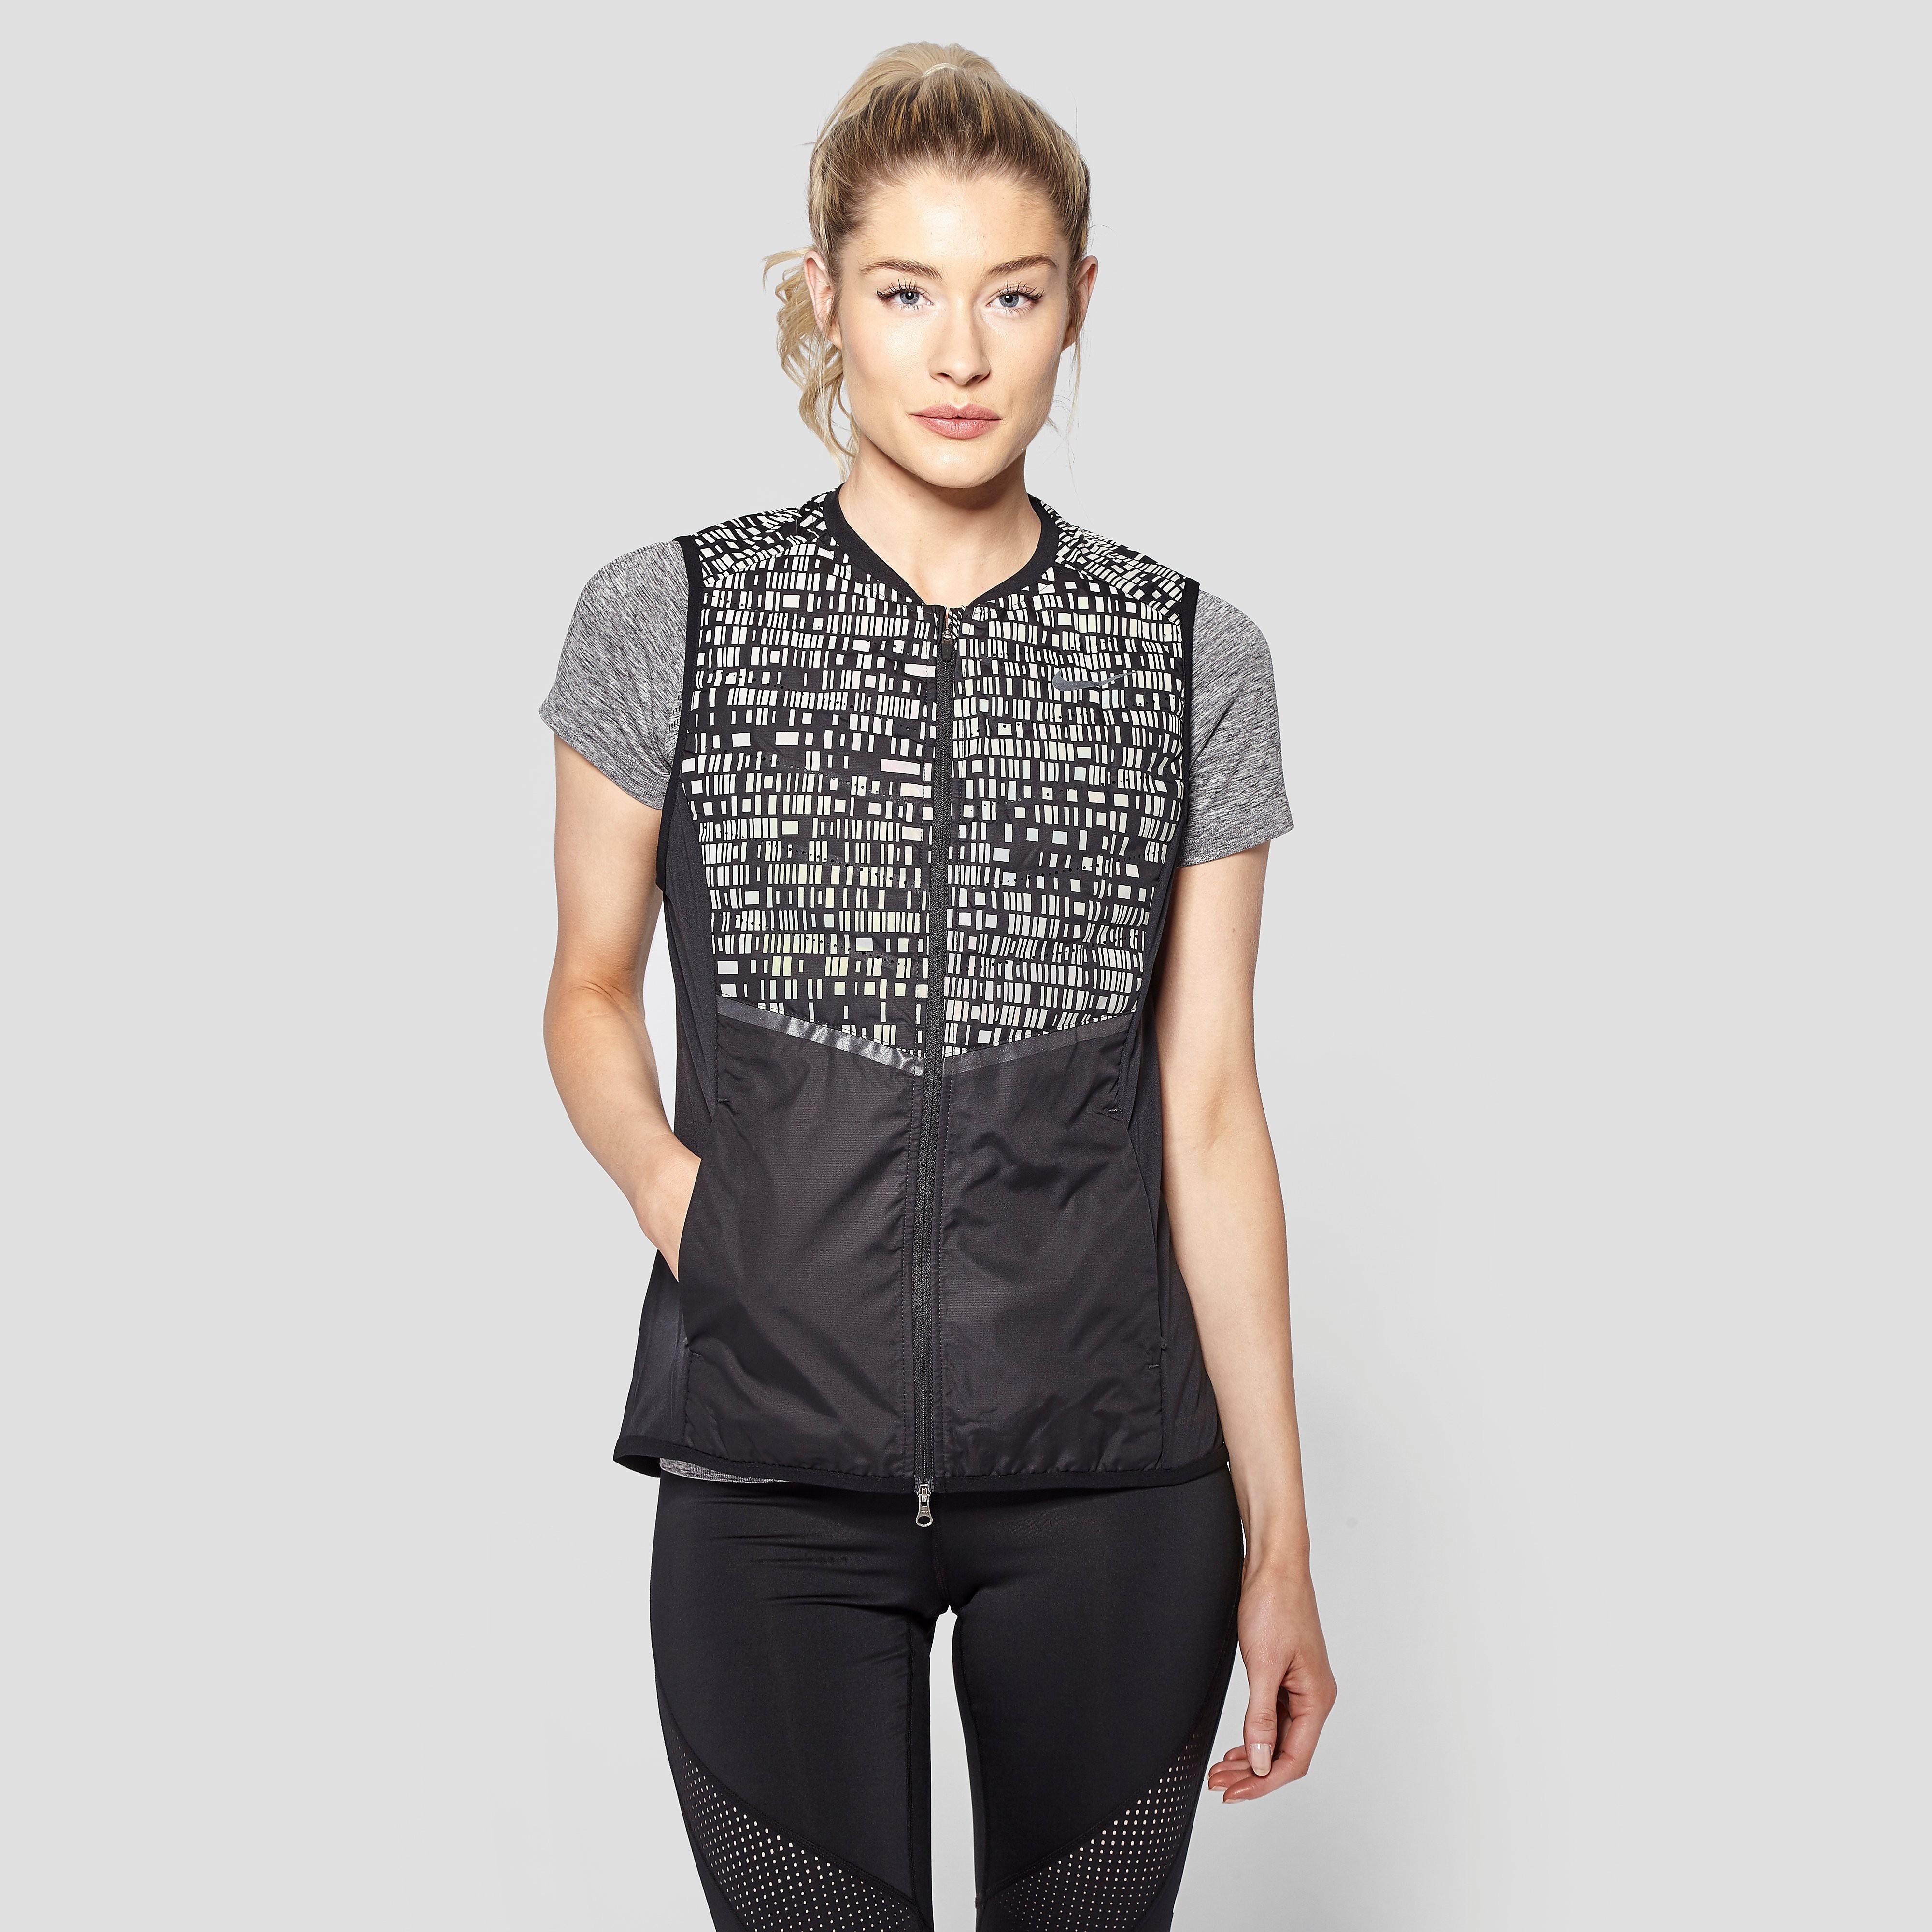 Nike Women's Aeroloft Flash Vest